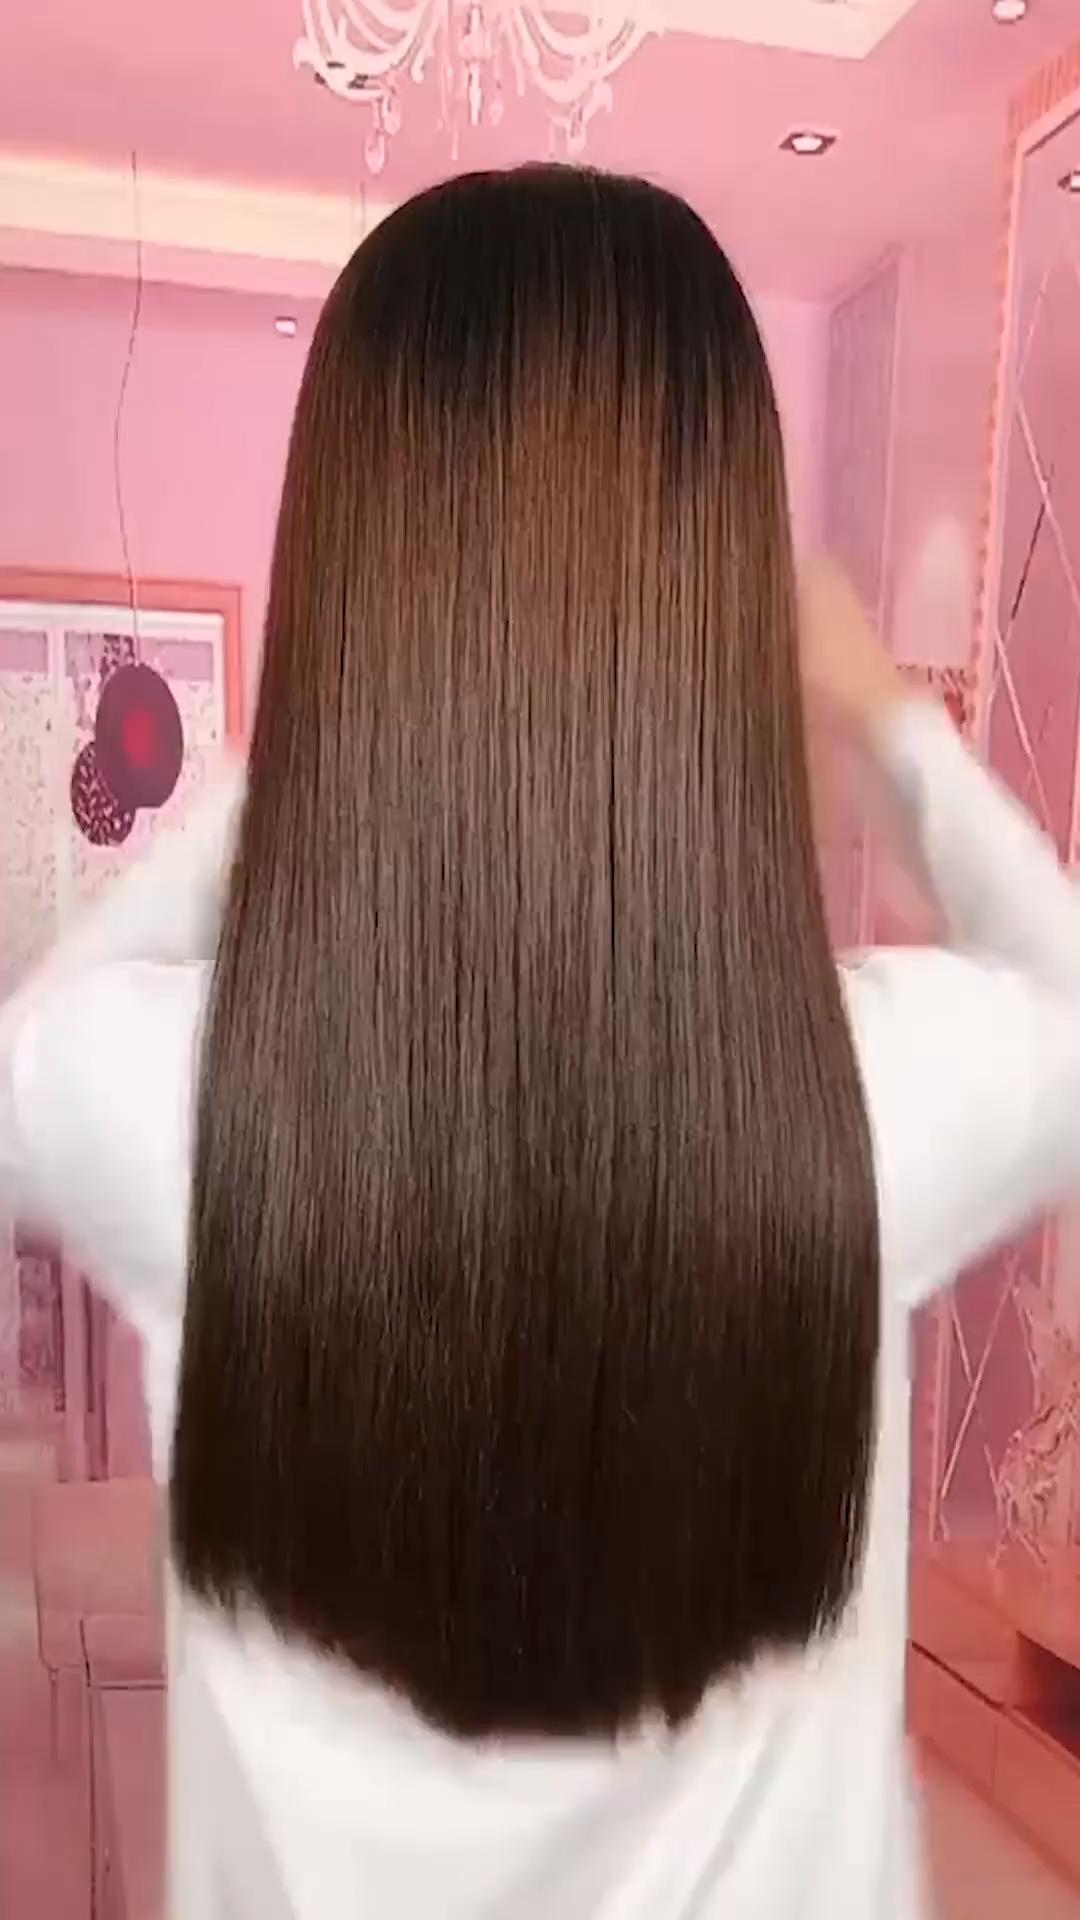 Hair Videos Peinados 2020 Hairstyle Tutorials For Long Hair In 2020 Hair Styles Long Hair Tutorial Hair Tutorial